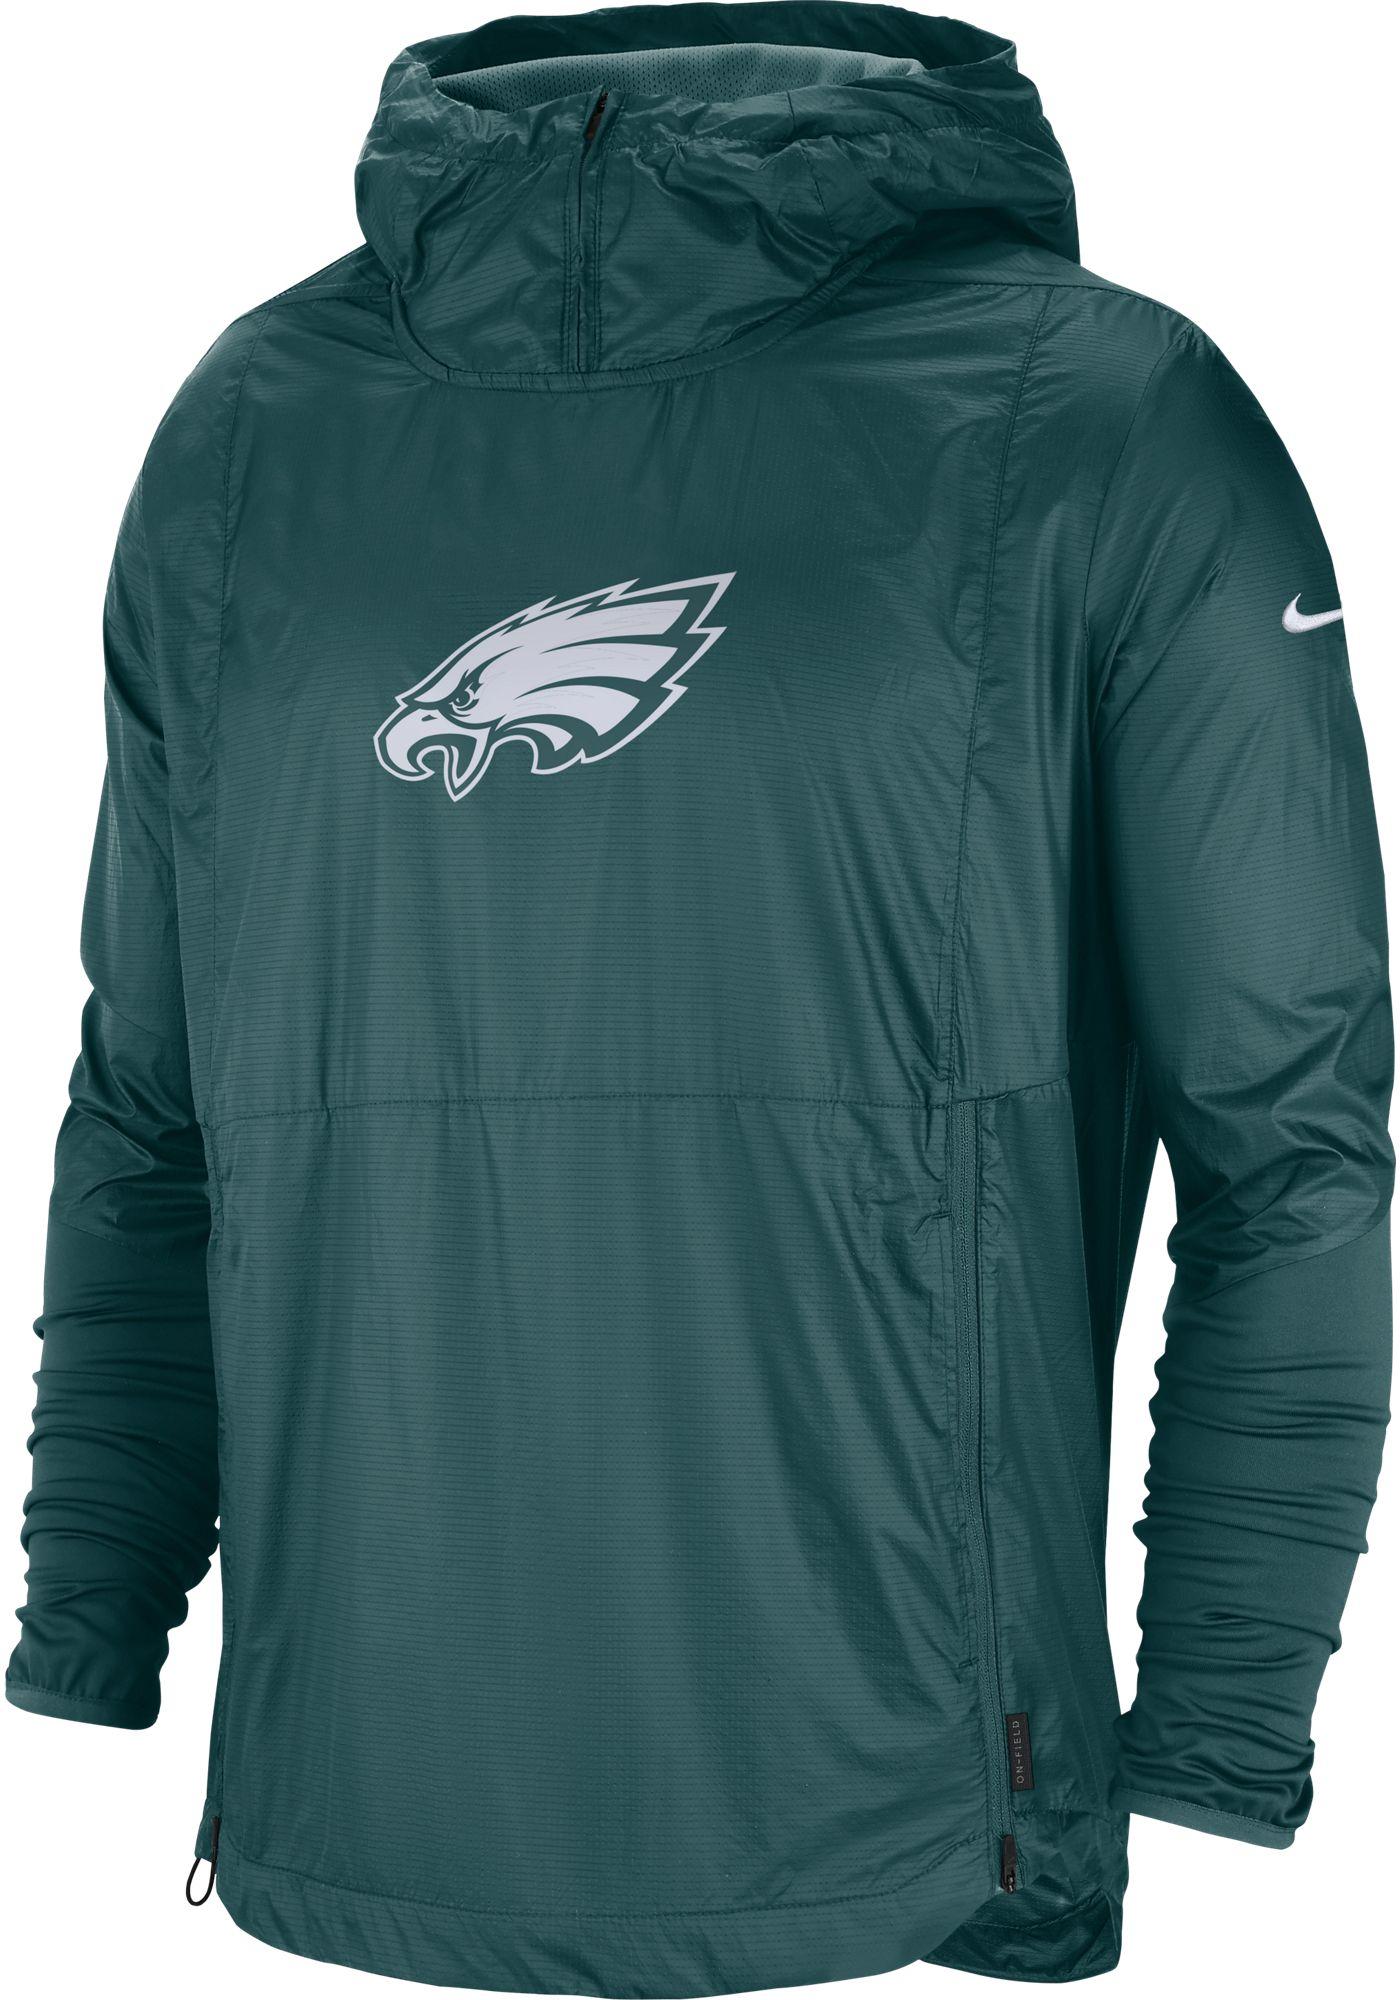 Nike Men's Philadelphia Eagles Sideline Repel Player Green Jacket